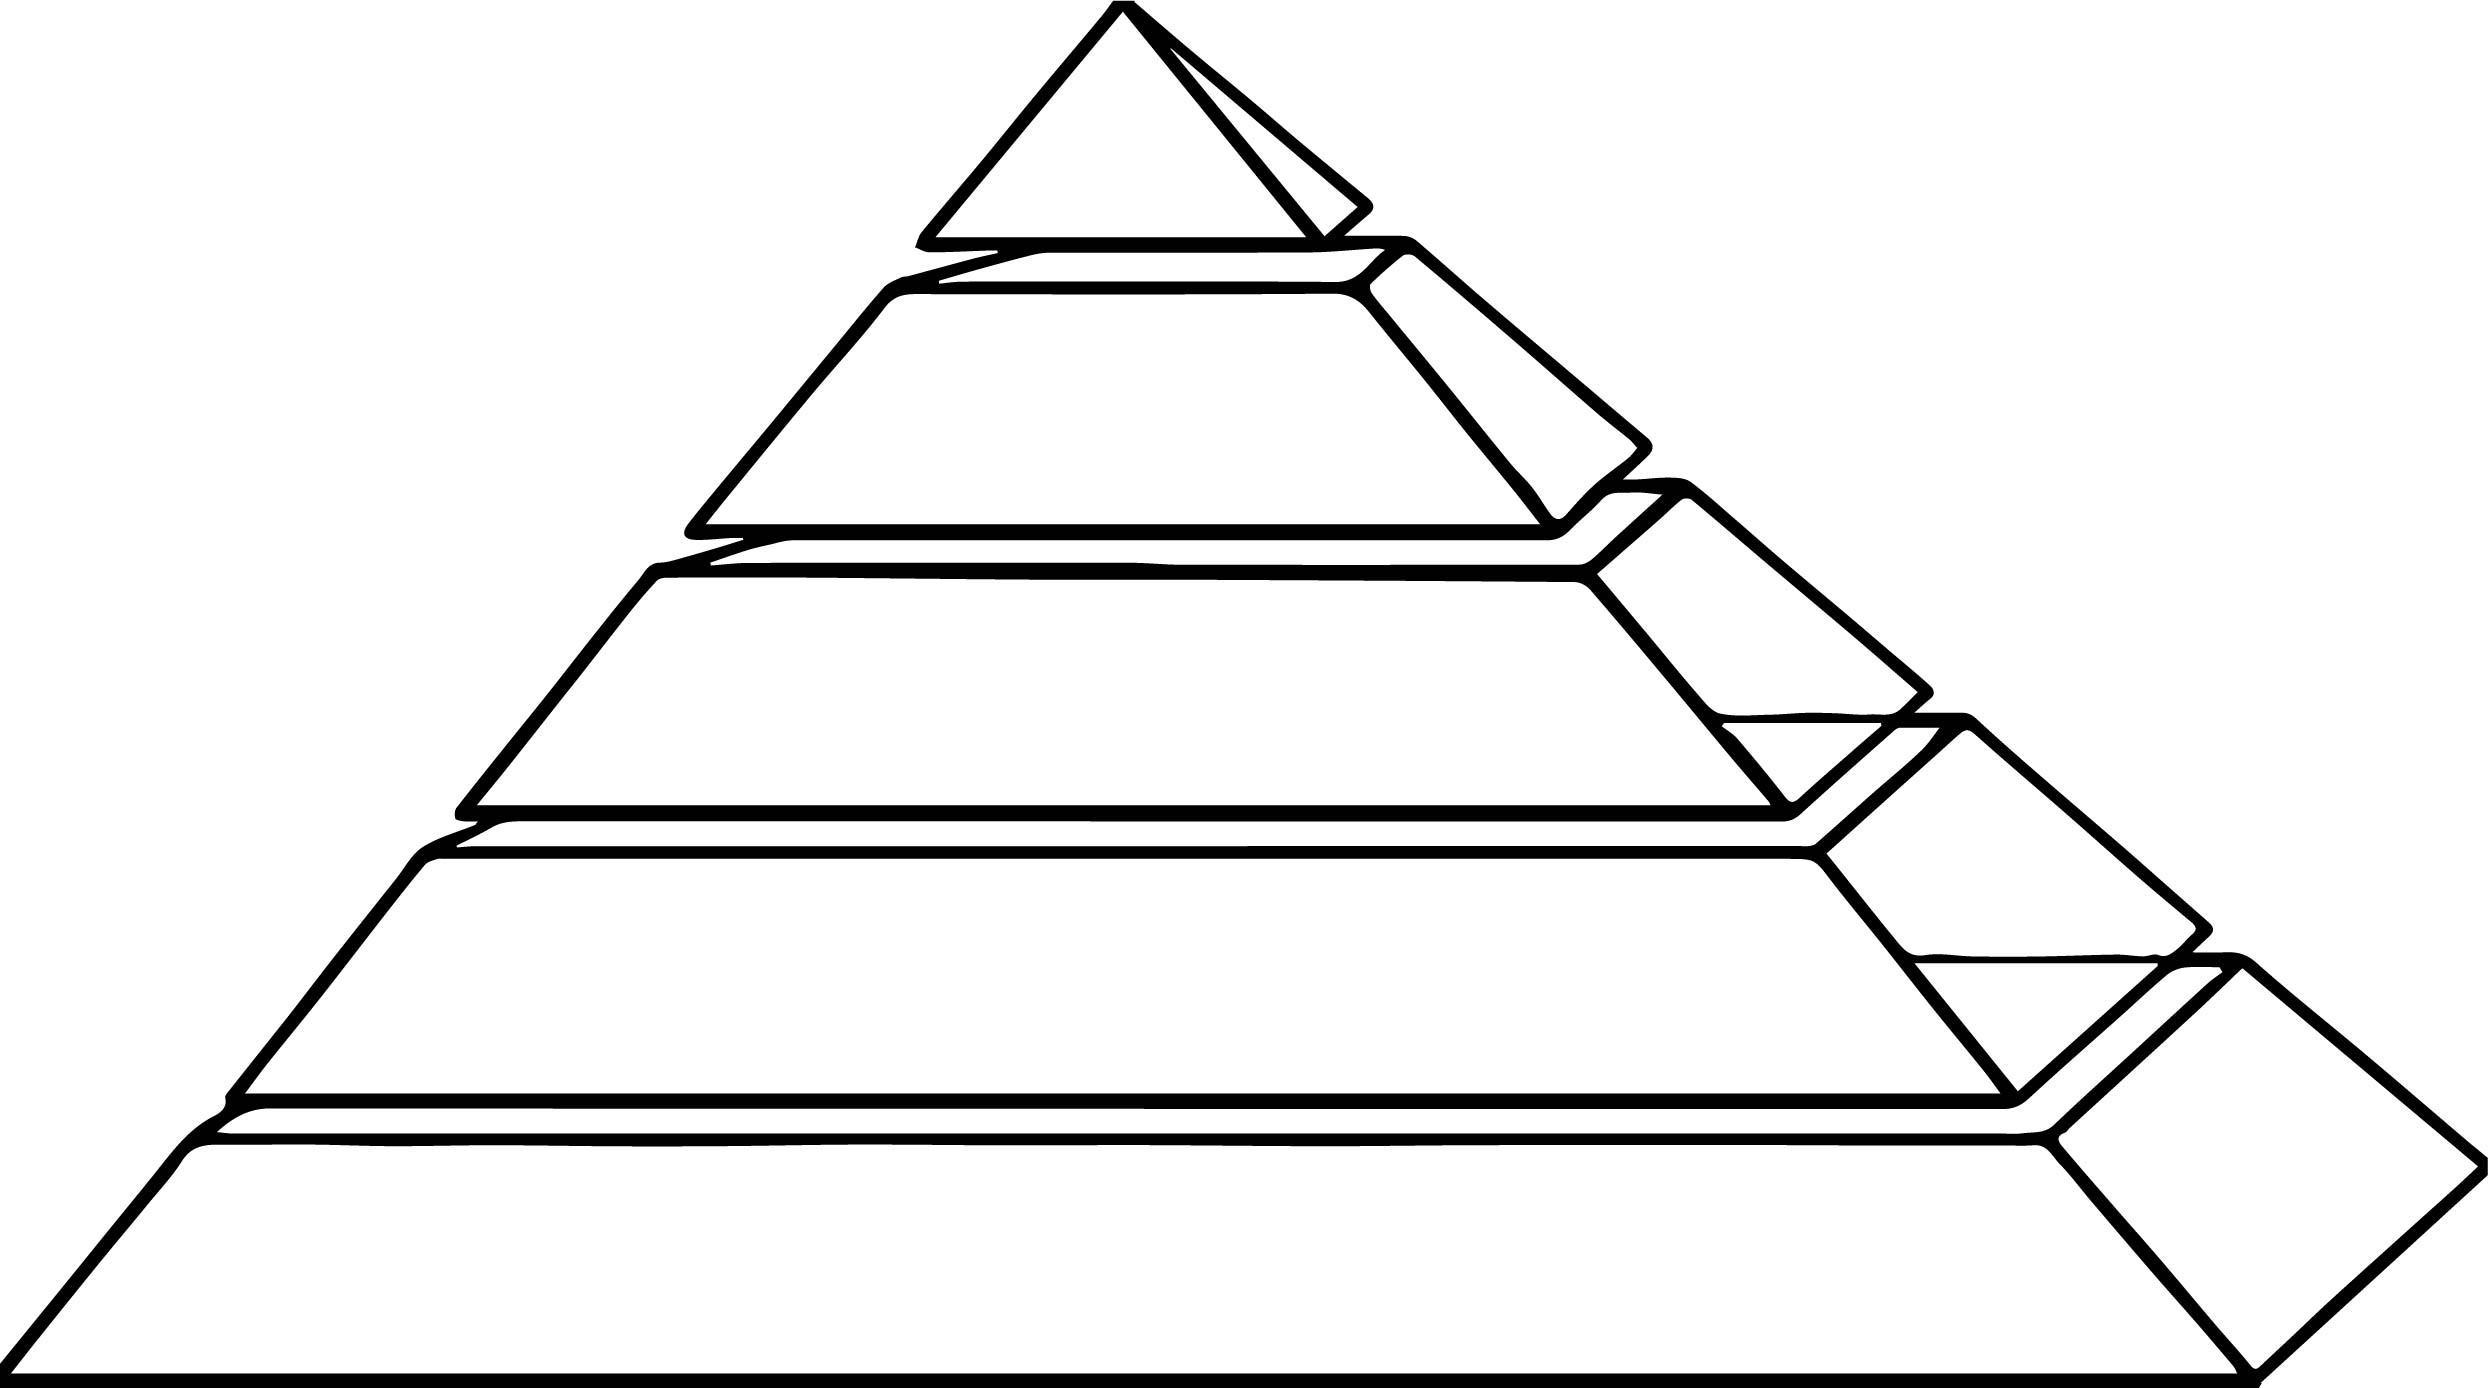 Pyramid Aztec Free Coloring Page Wecoloringpage